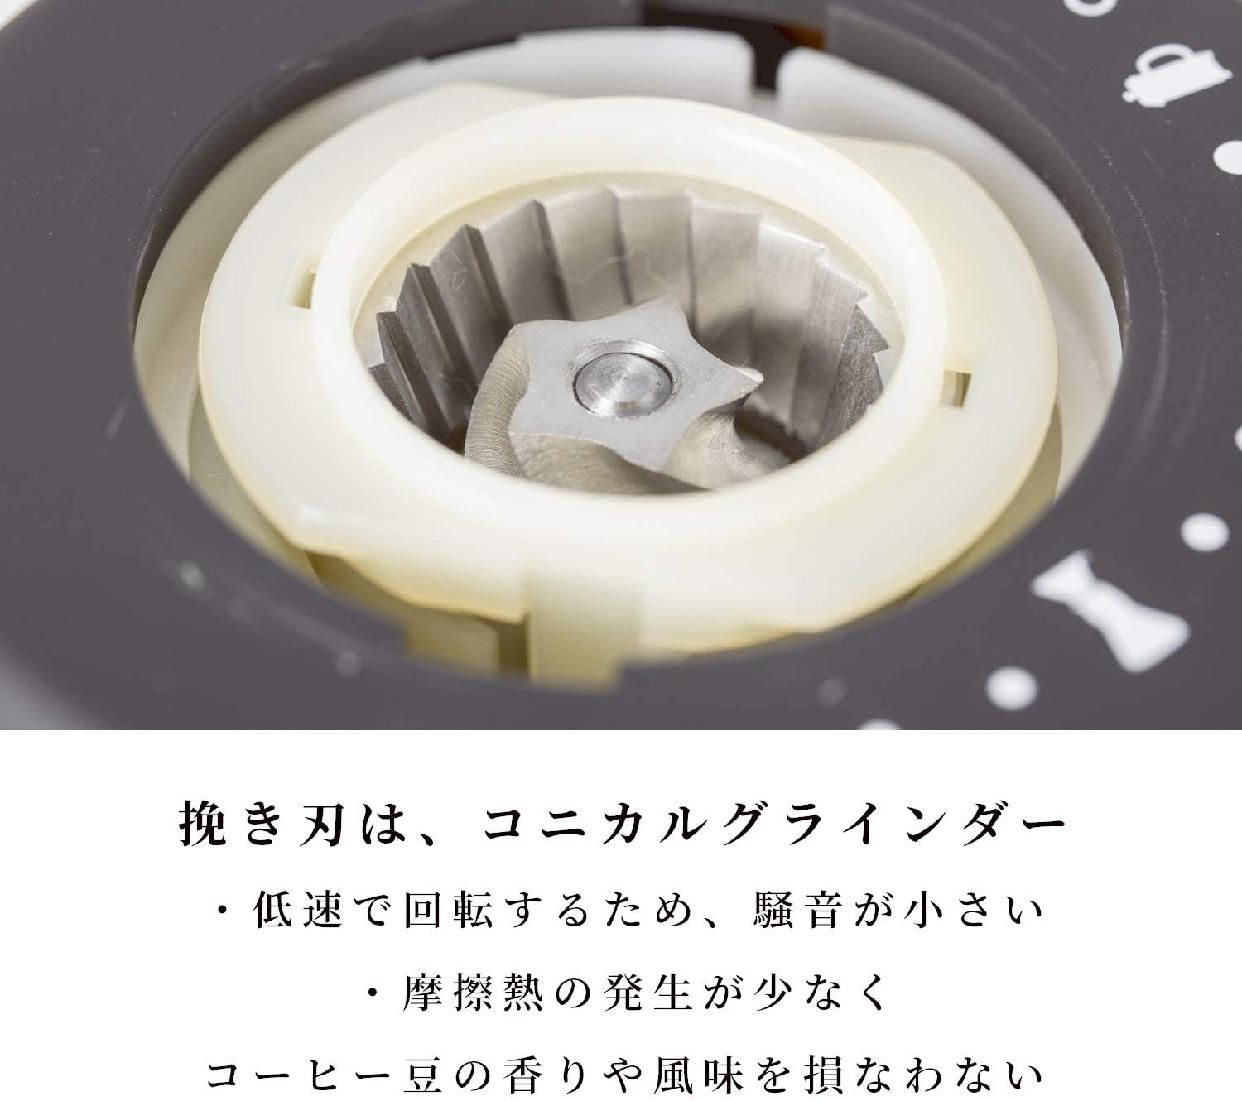 bodum(ボダム) BISTRO コーヒーグラインダー 10903-01JP-3の商品画像2